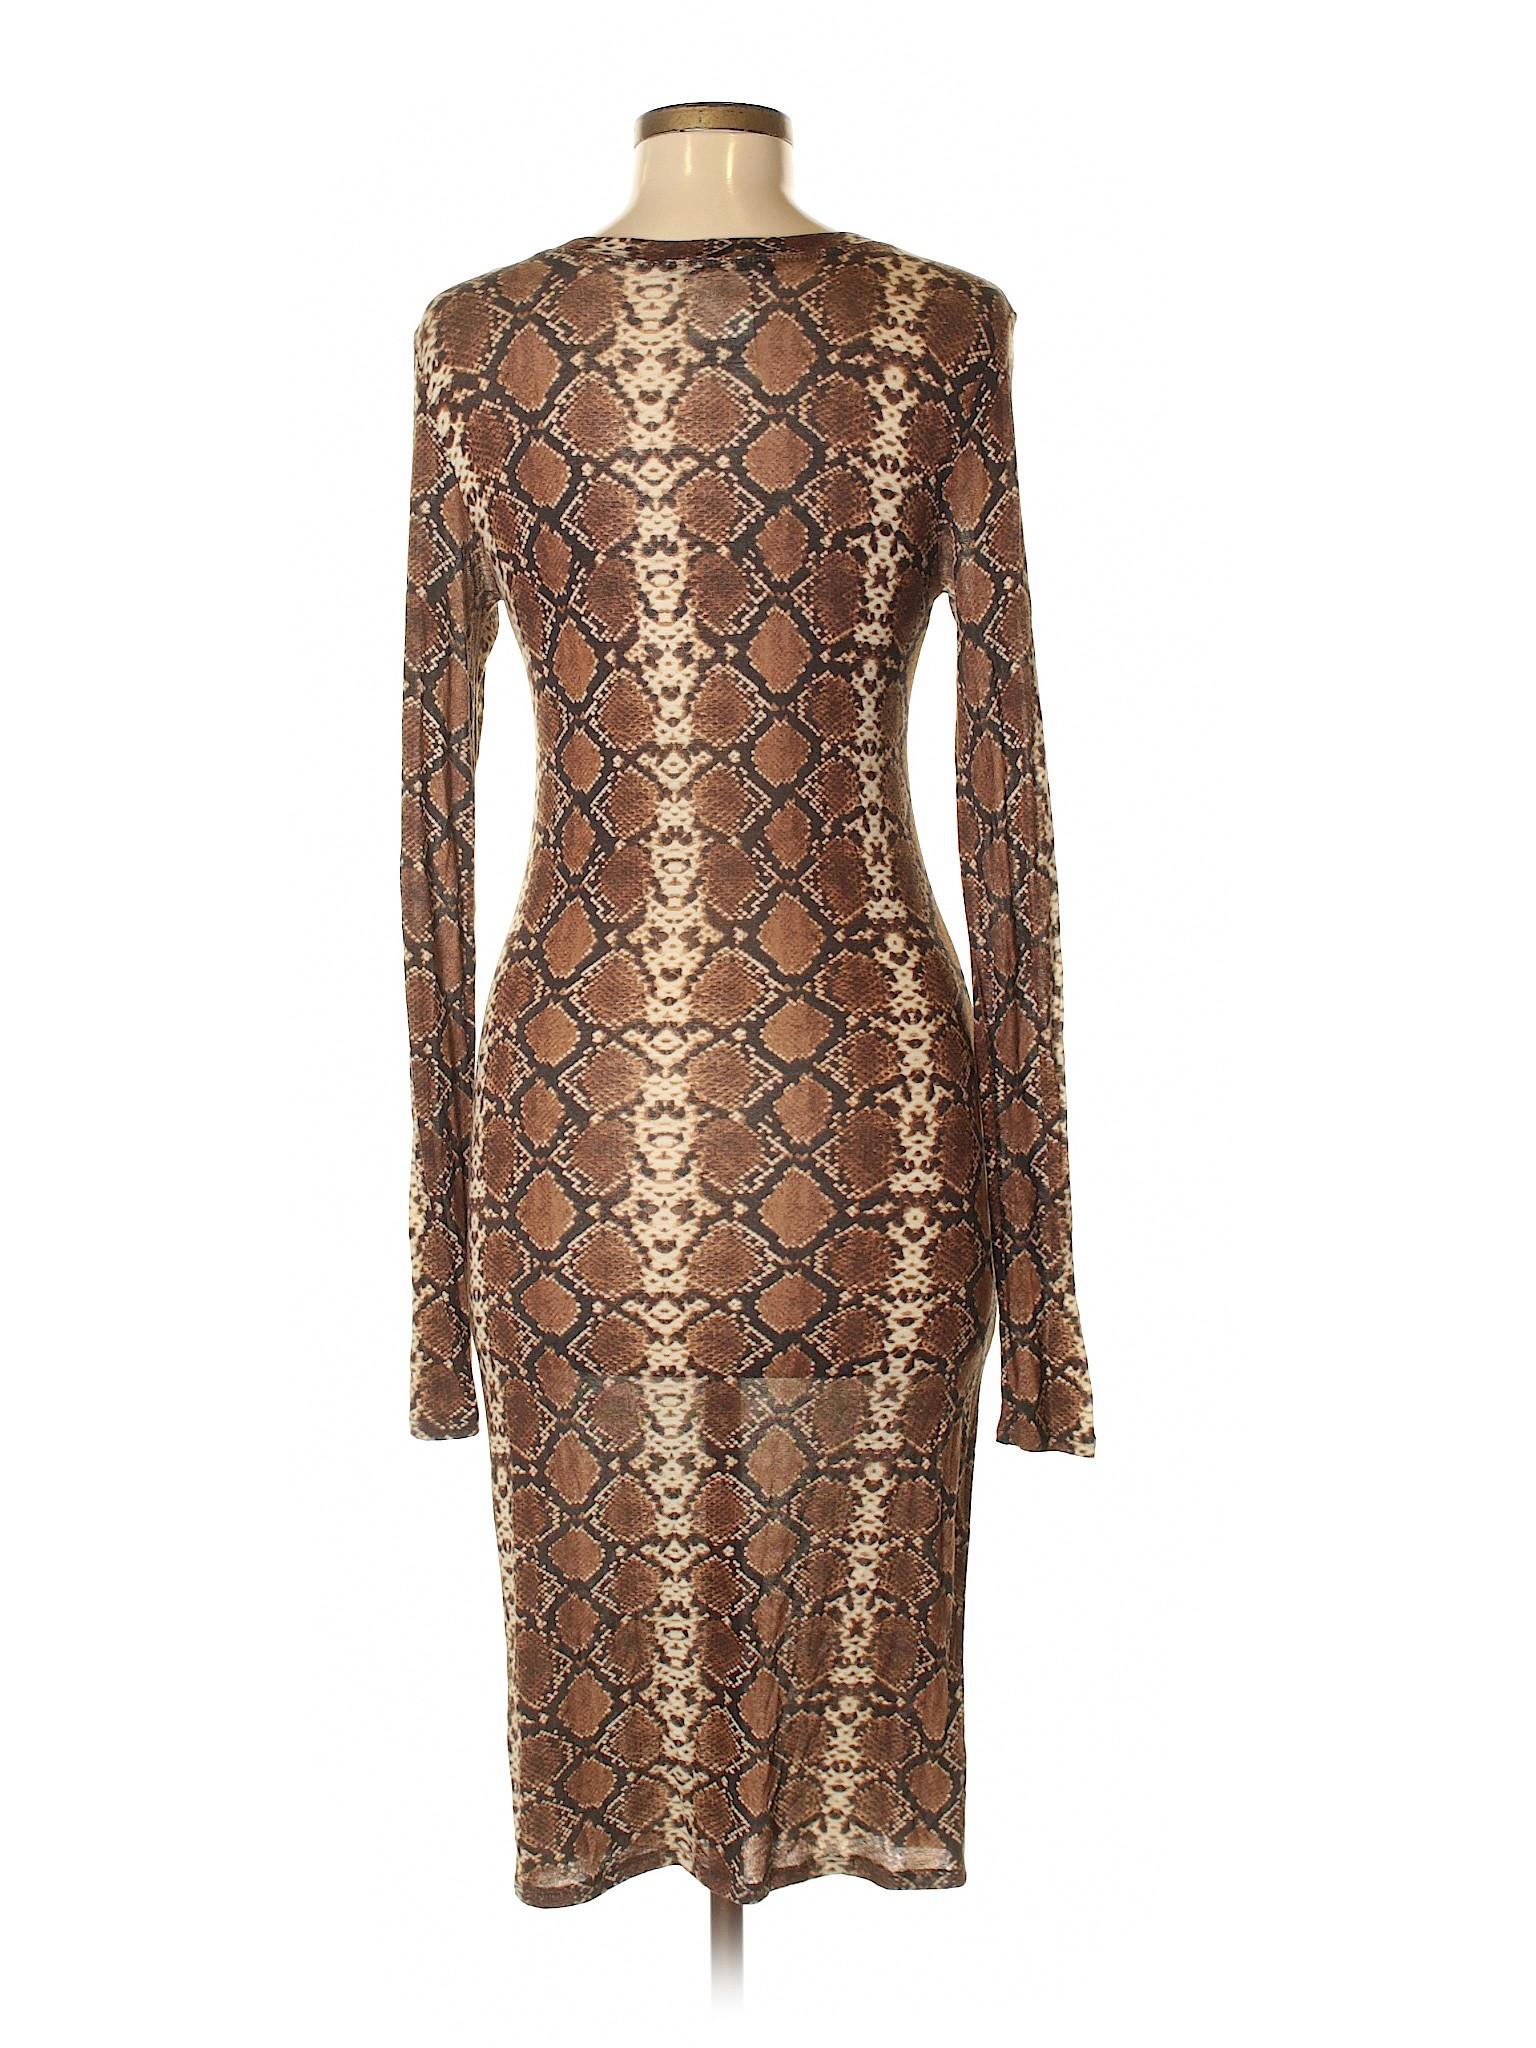 BCBGMAXAZRIA Casual Dress Selling BCBGMAXAZRIA Dress Casual Dress Selling Casual BCBGMAXAZRIA Selling Selling xrOZAqXwrH